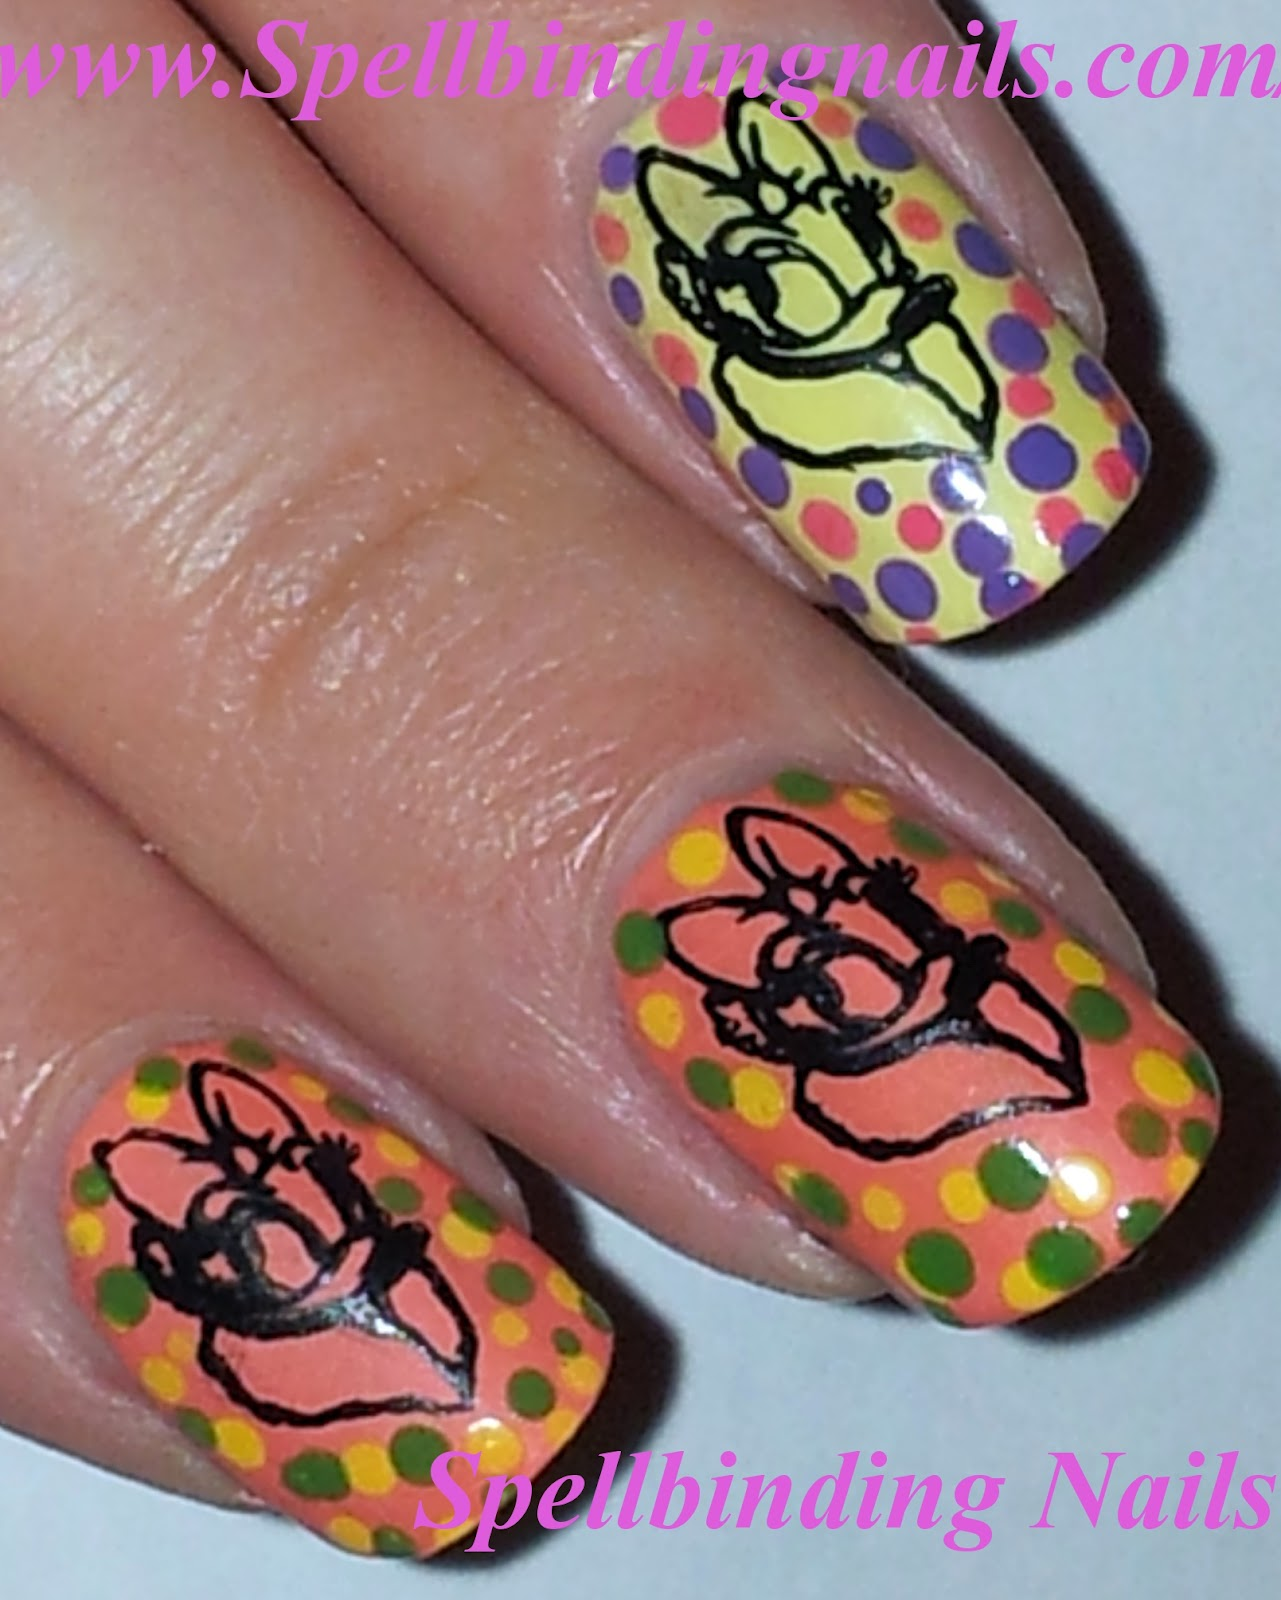 Spellbinding Nails: Fab IV + \' Daisy Duck! \'